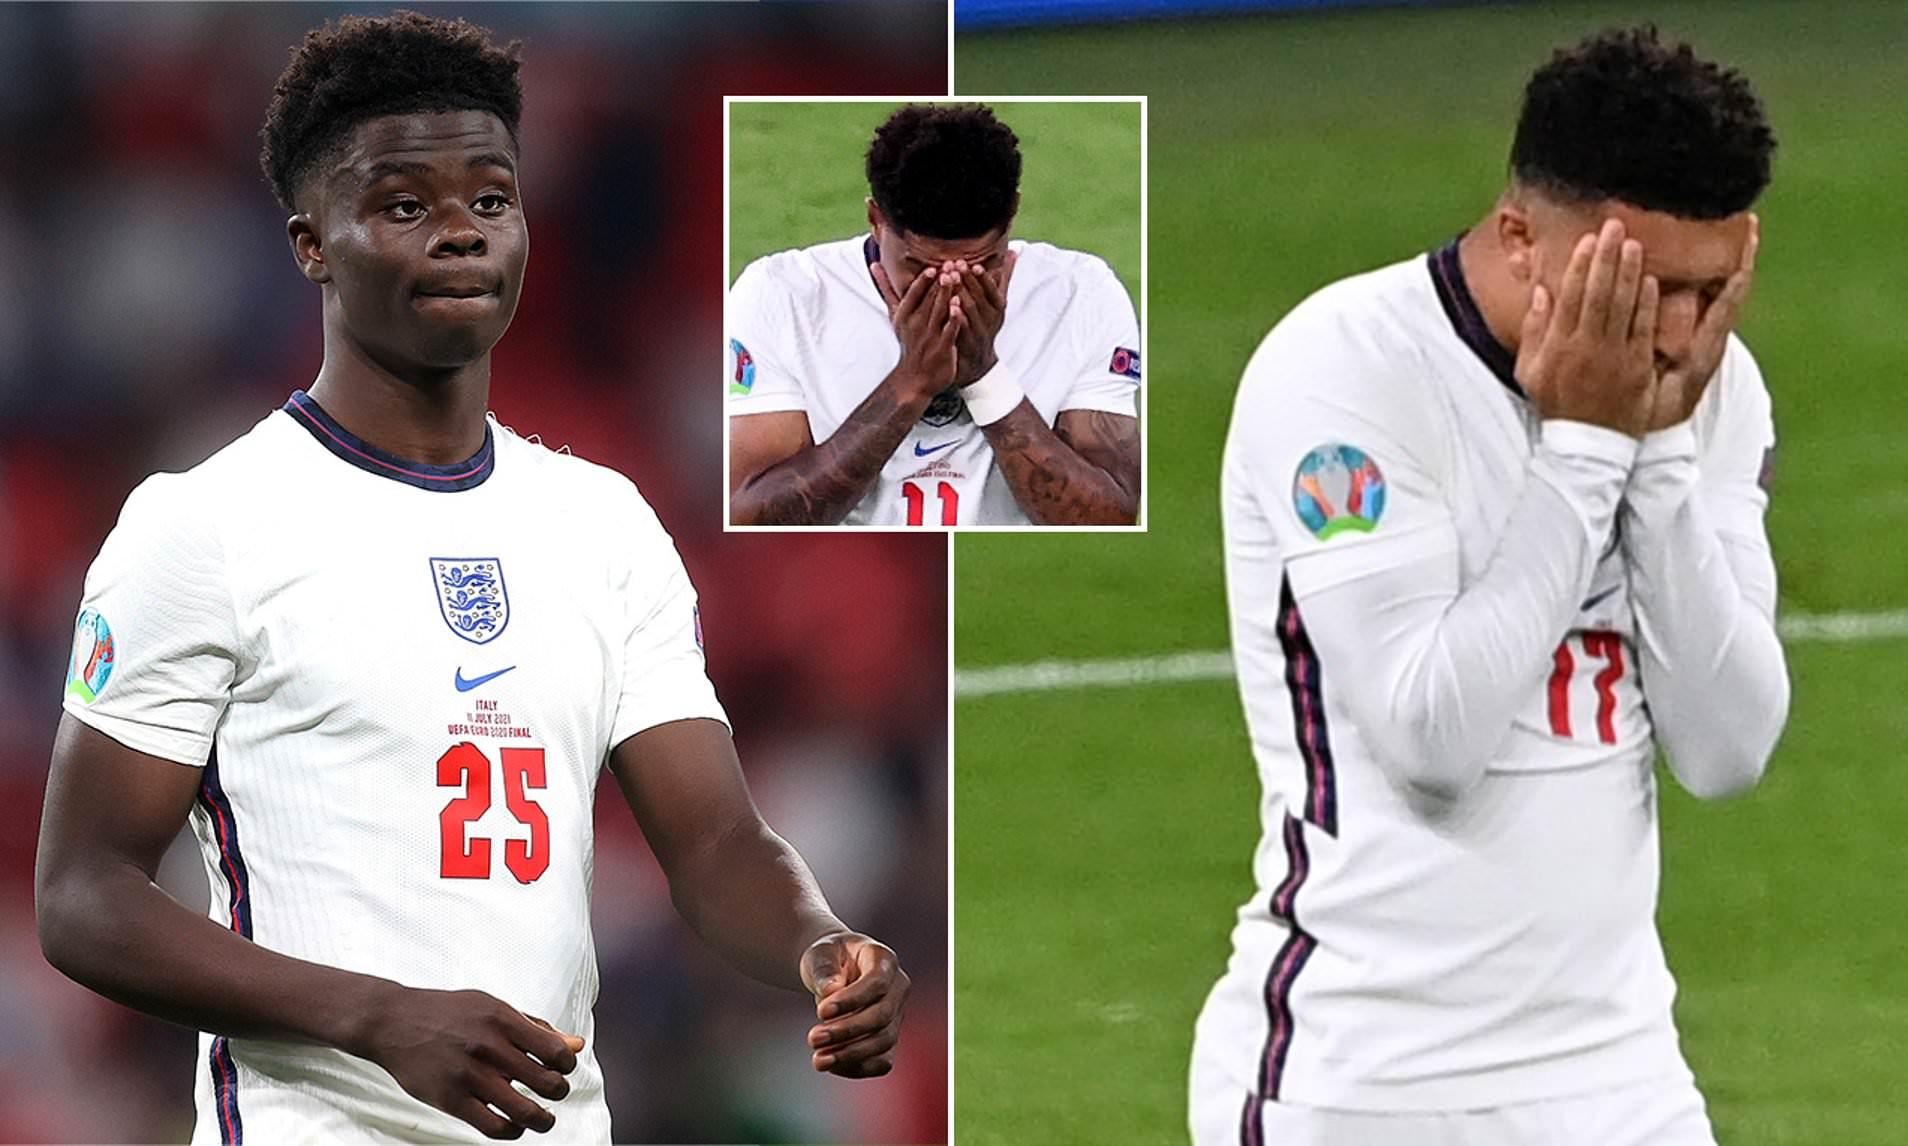 FA to offer Bukayo Saka, Jadon Sancho and Marcus Rashford option to pursue criminal action over ?racial abuse